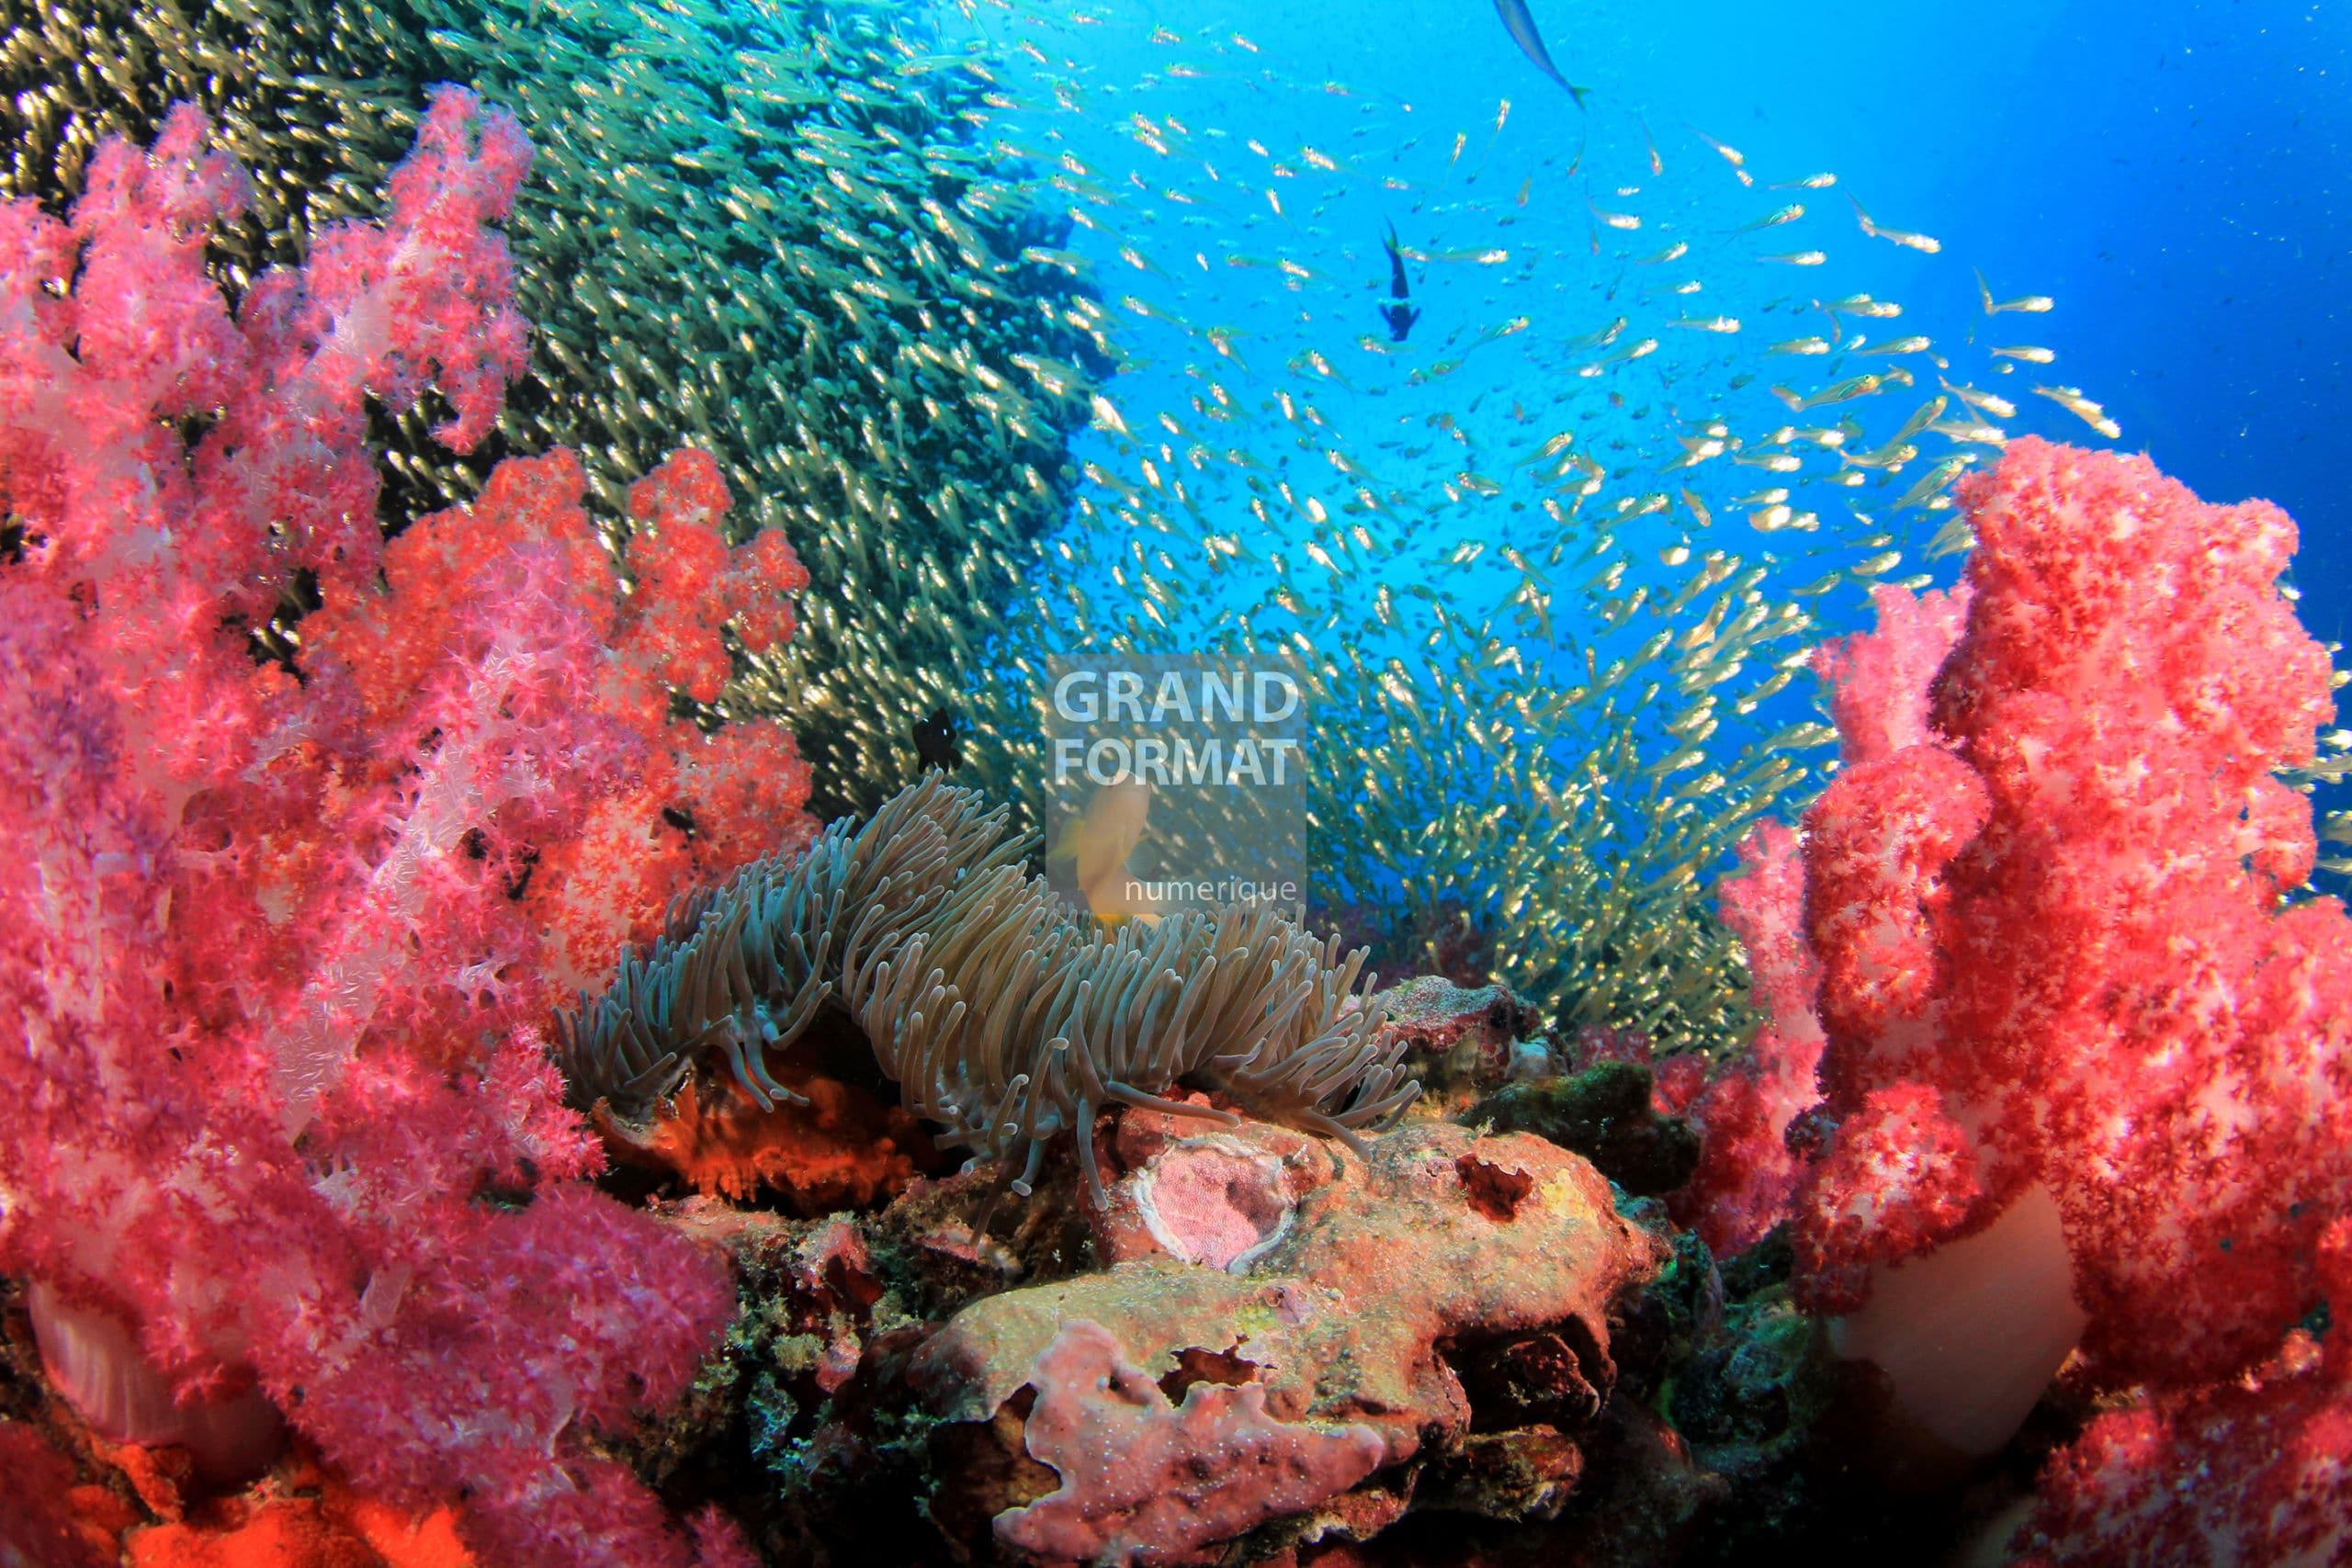 Mer océan photo impression et toile